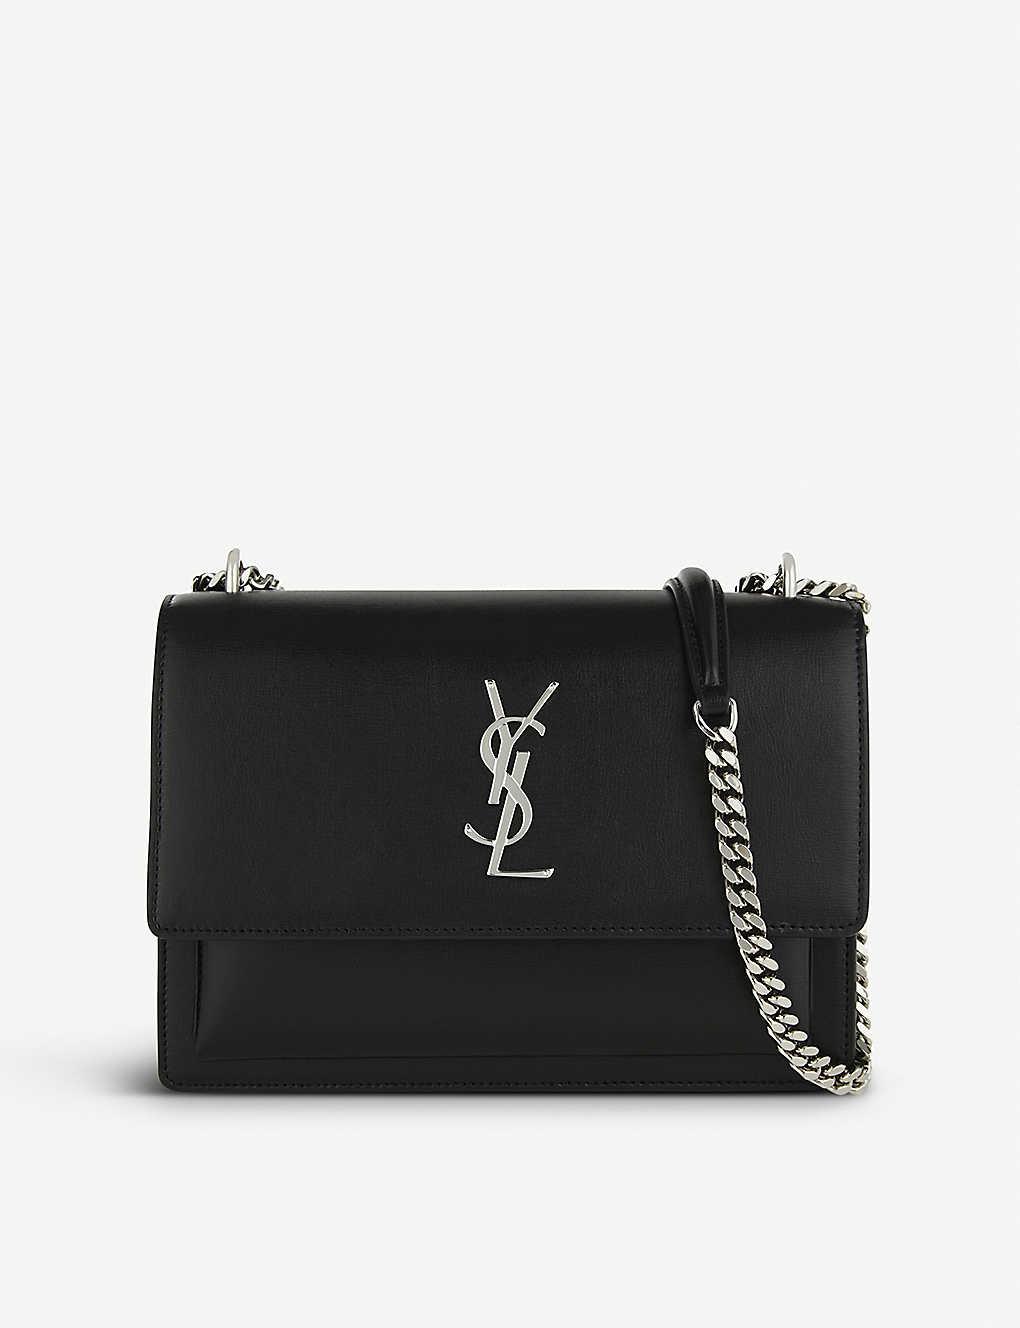 SAINT LAURENT: Monogram Sunset medium leather cross-body bag